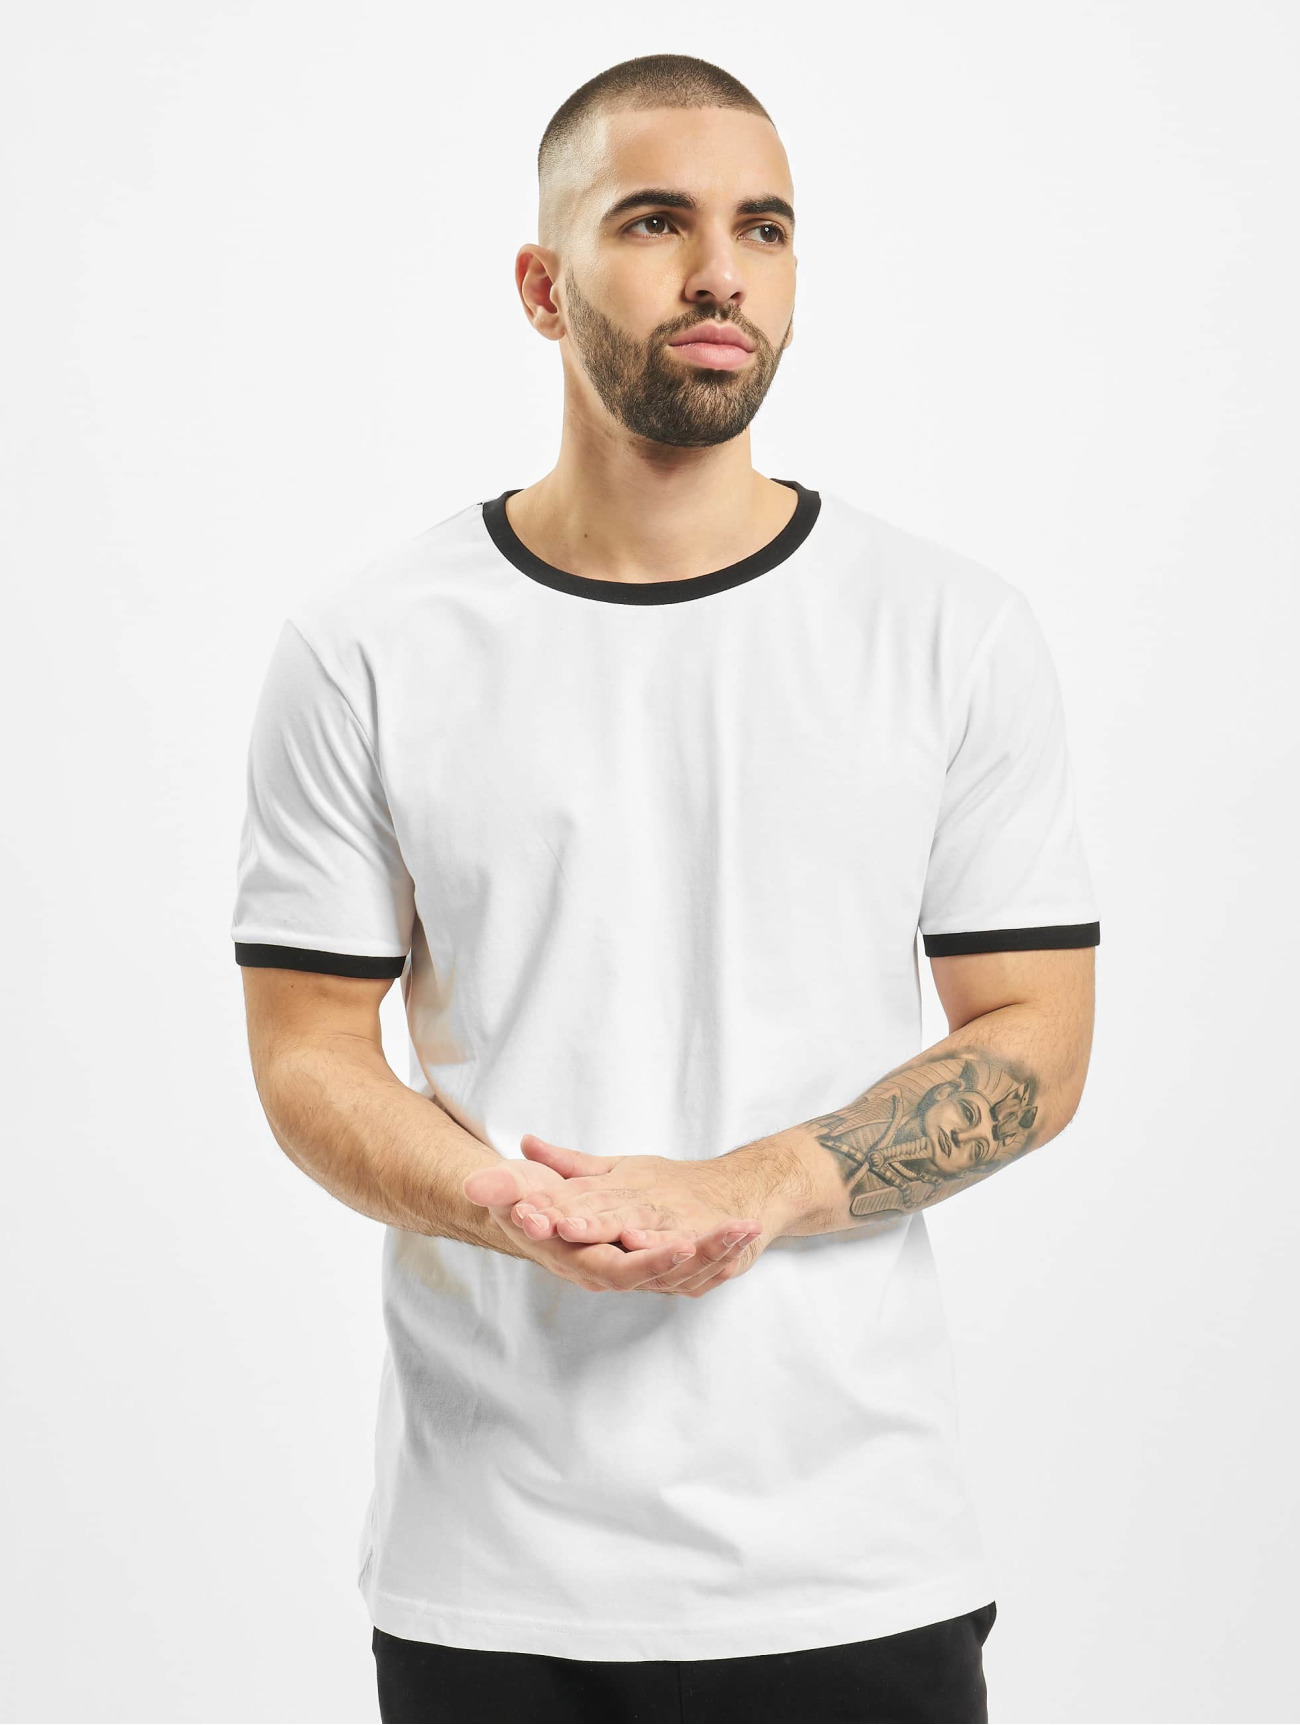 Urban Classics   Ringer   blanc Homme T-Shirt  305464  Homme Hauts